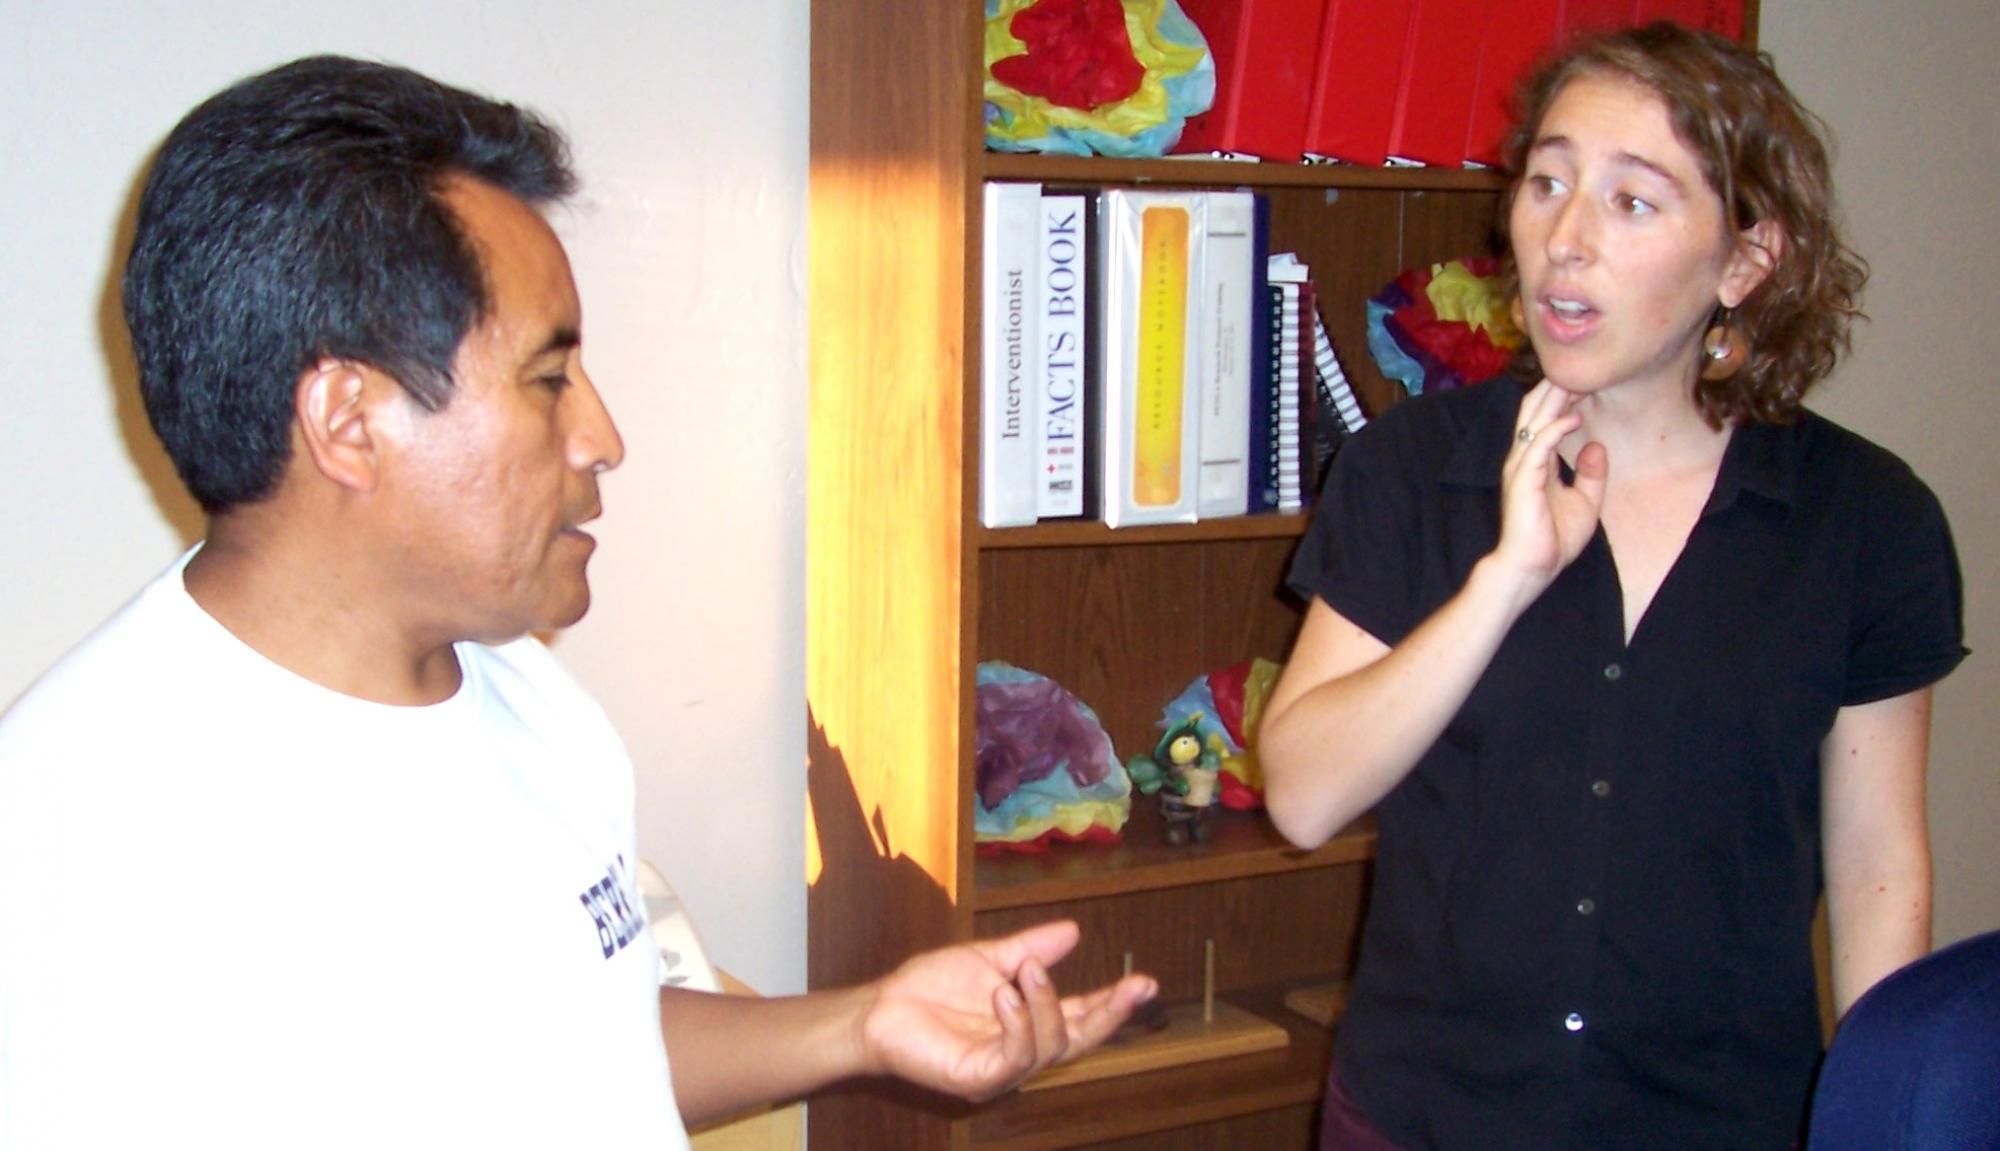 Sebastian Quinac and Nina Rabin